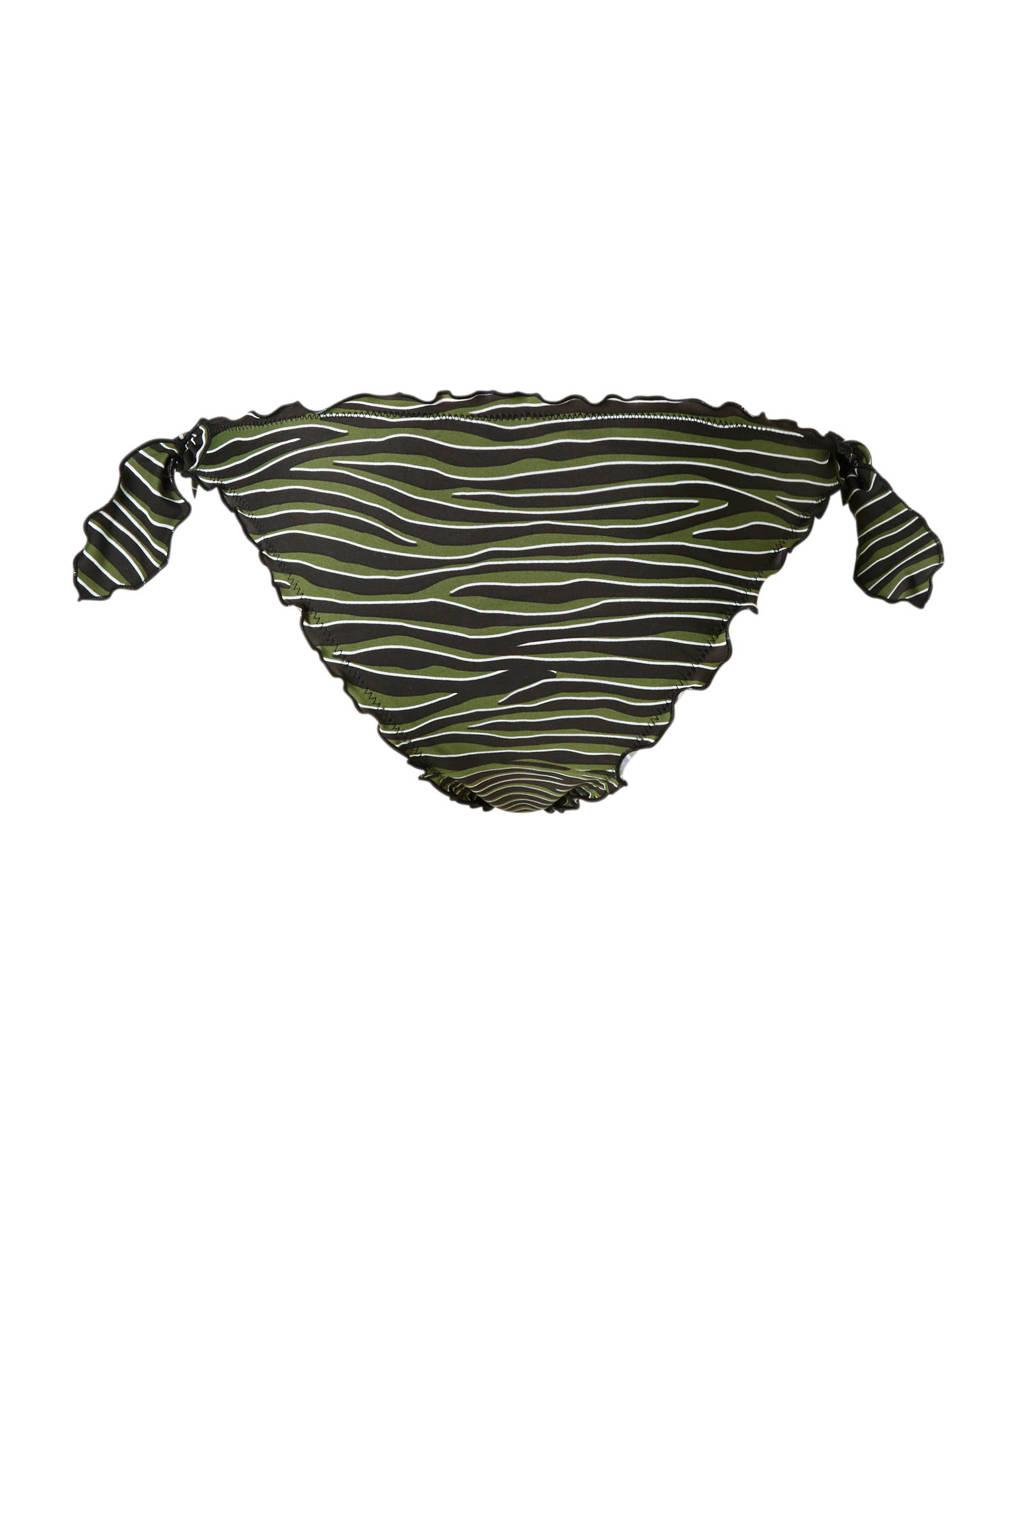 Strepen Met Whkmp's Groen Bikini Broekje Beachwavestrik nx887ZwI0